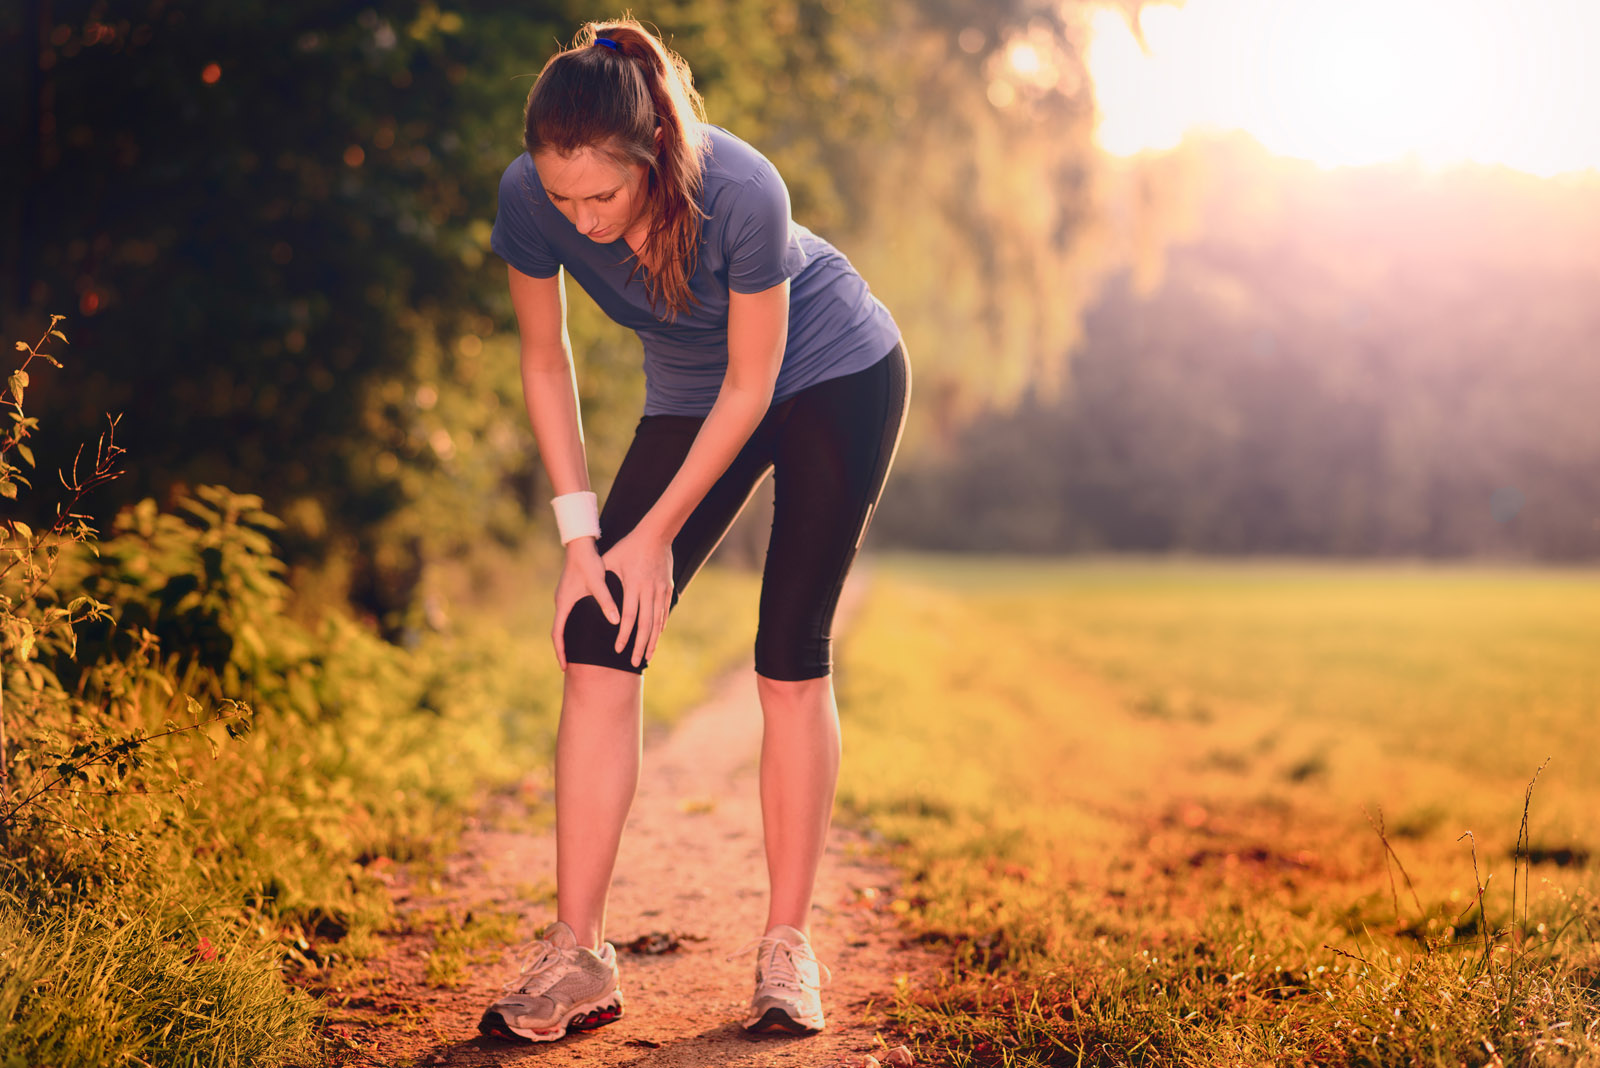 Muscle sprains/strains